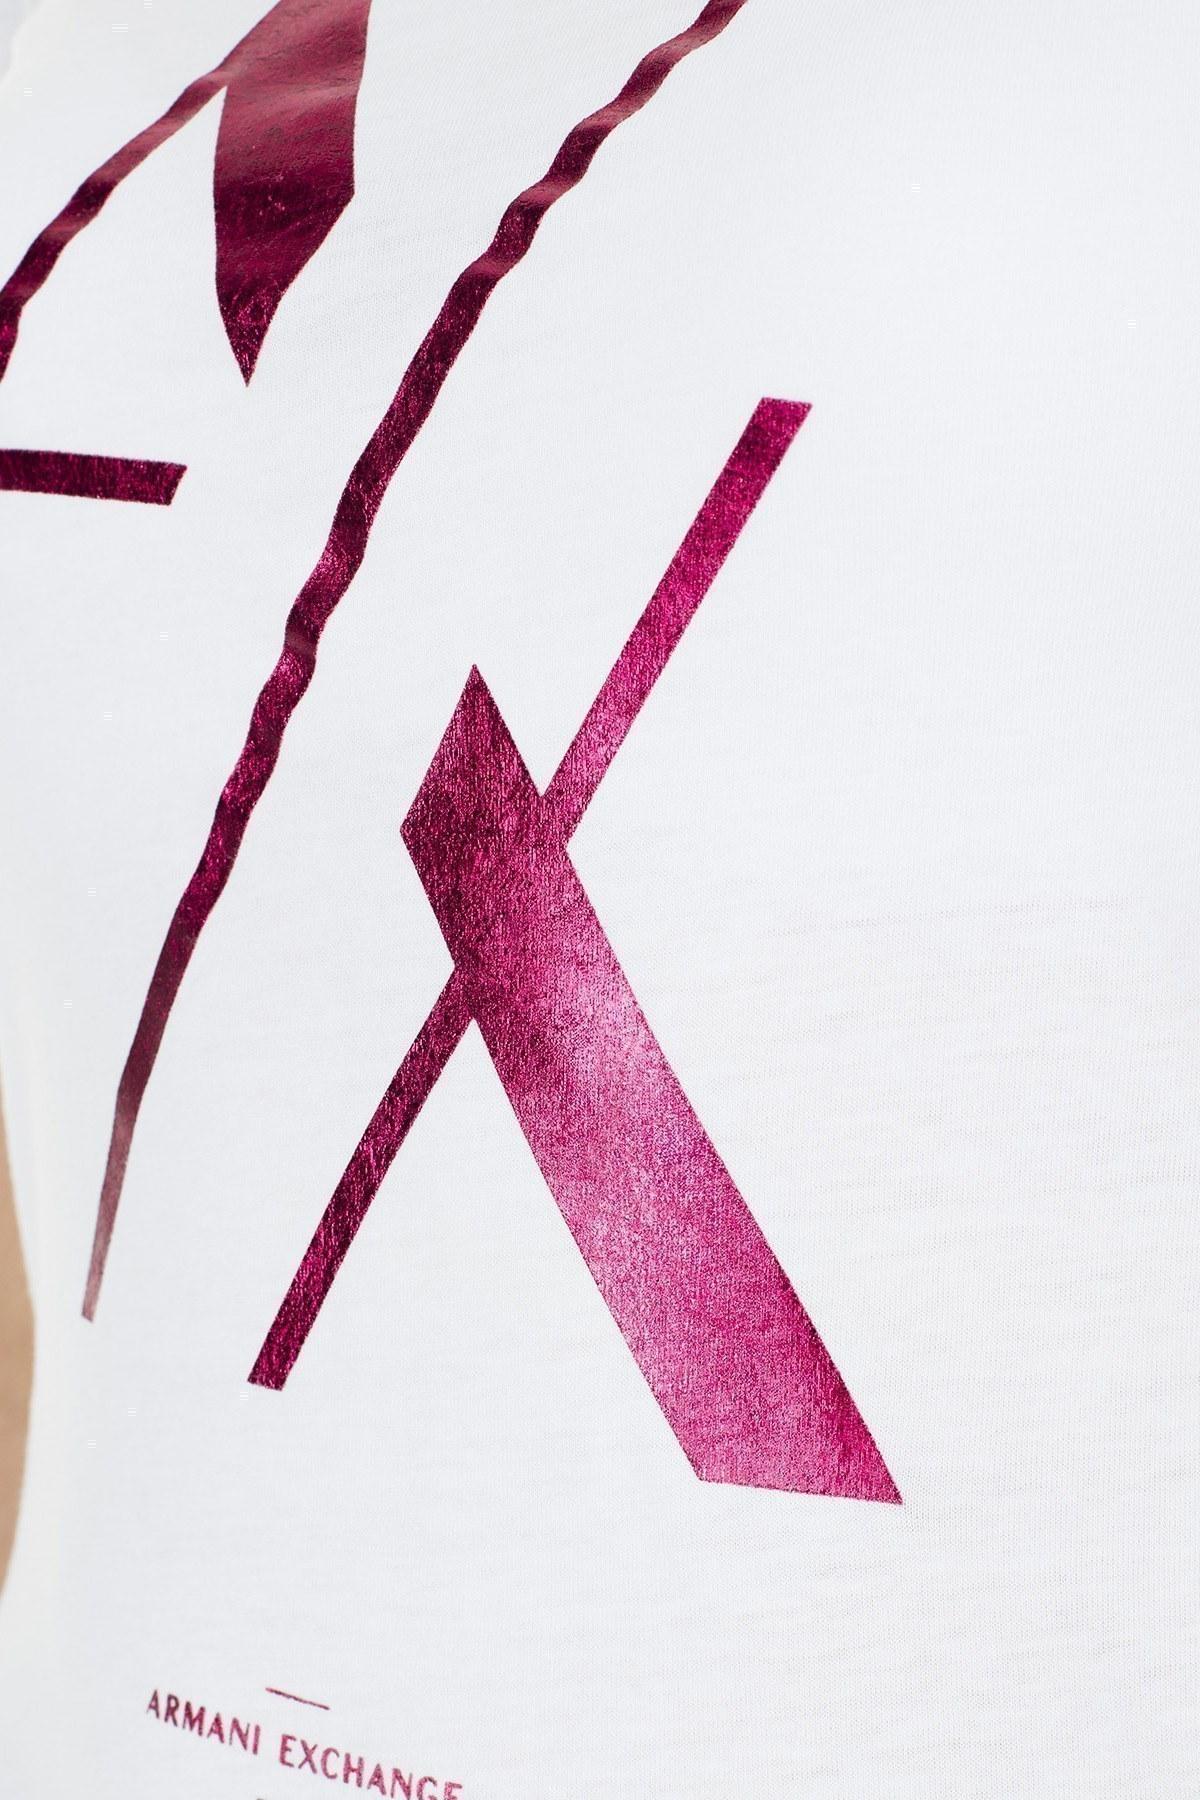 Armani Exchange Bayan T Shirt S 6GYTAK YJ73Z 1000 KIRIK BEYAZ